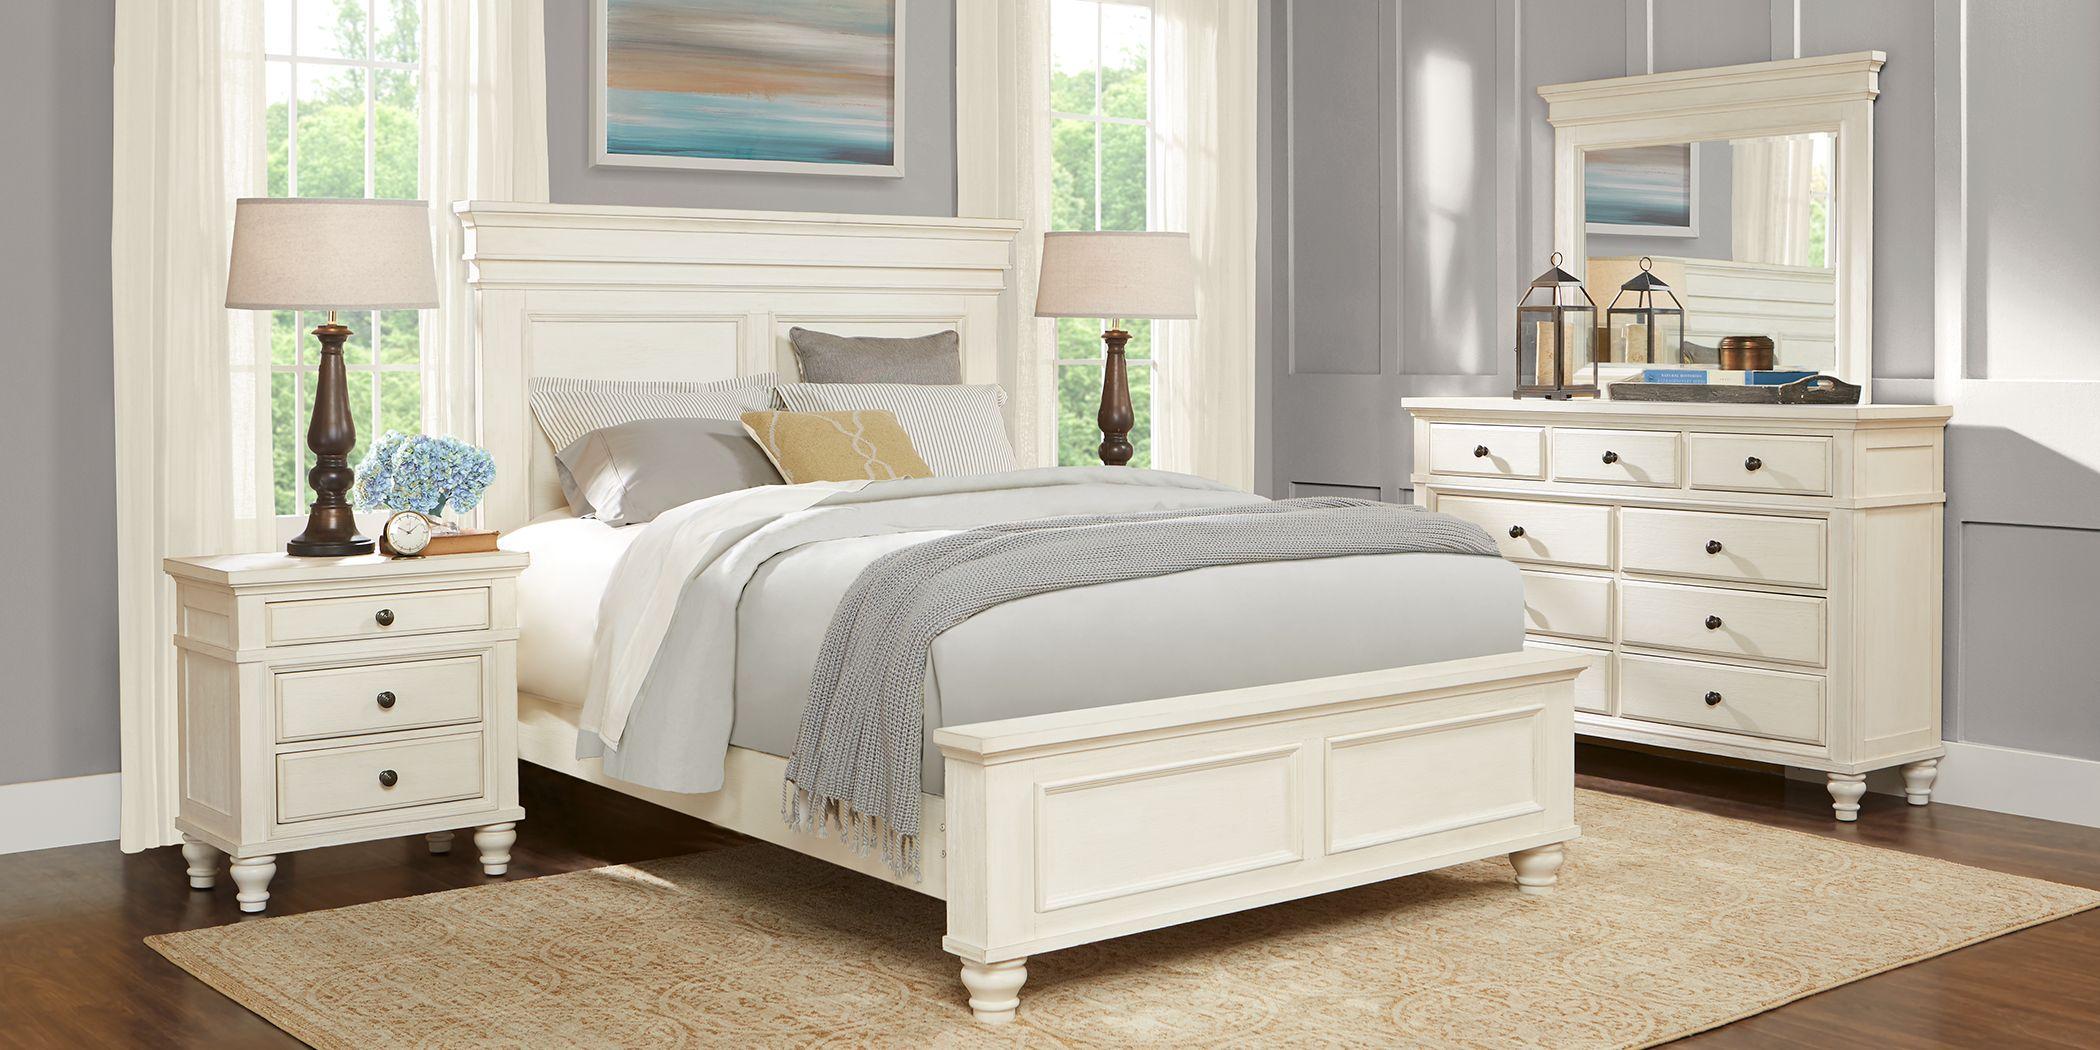 Lake Town Off-White 7 Pc King Panel Bedroom